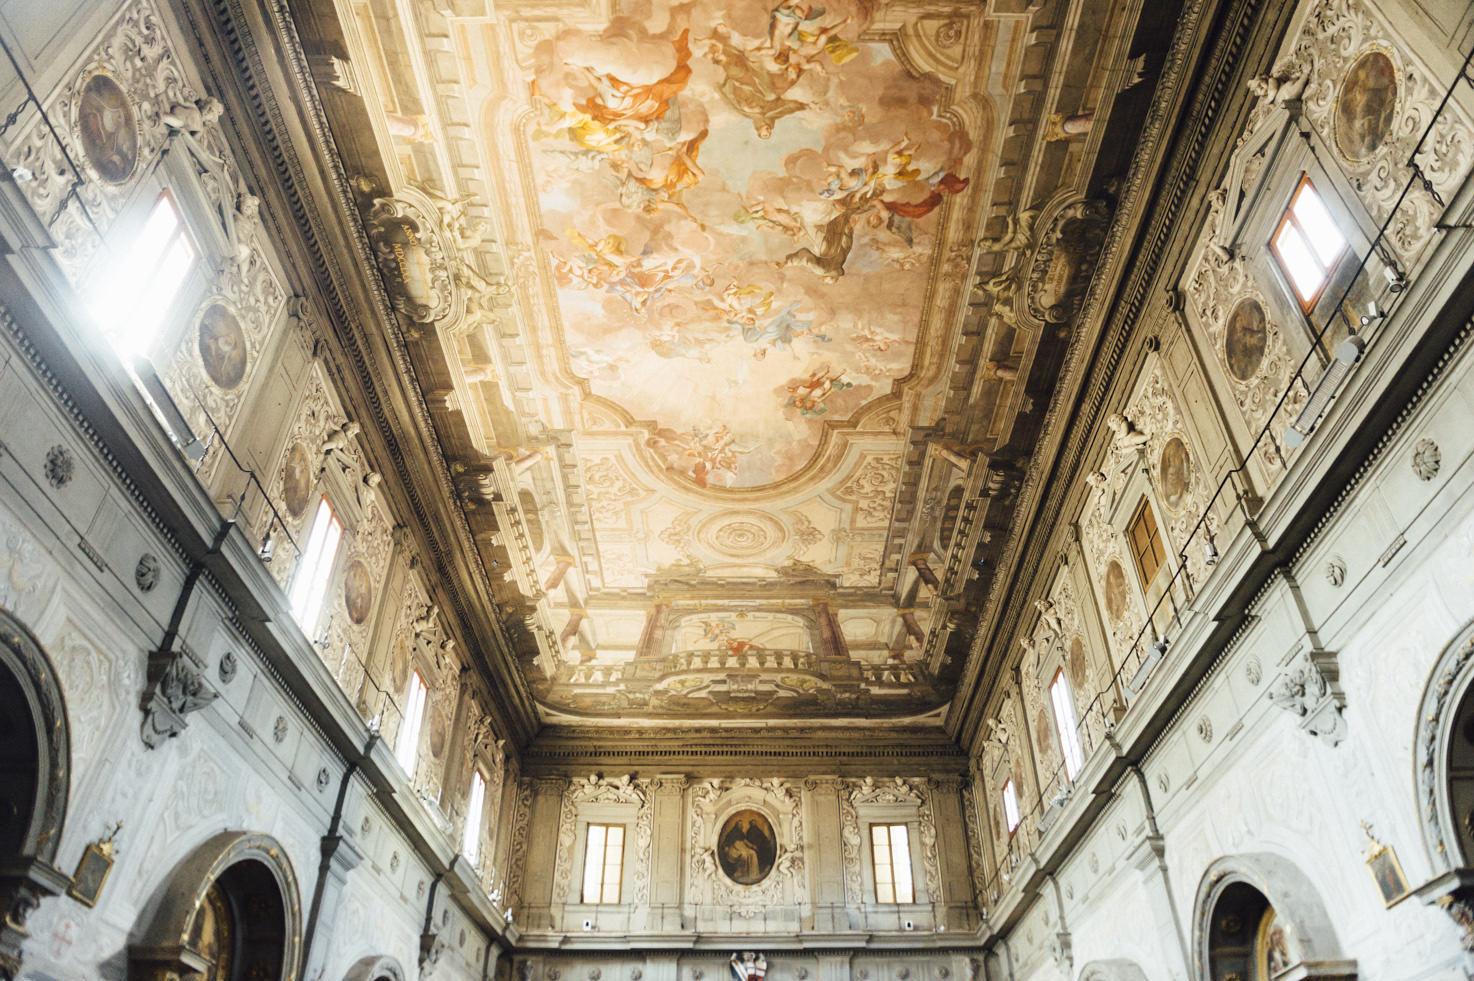 Frescoed ceiling of Chiesa di Ognissanti